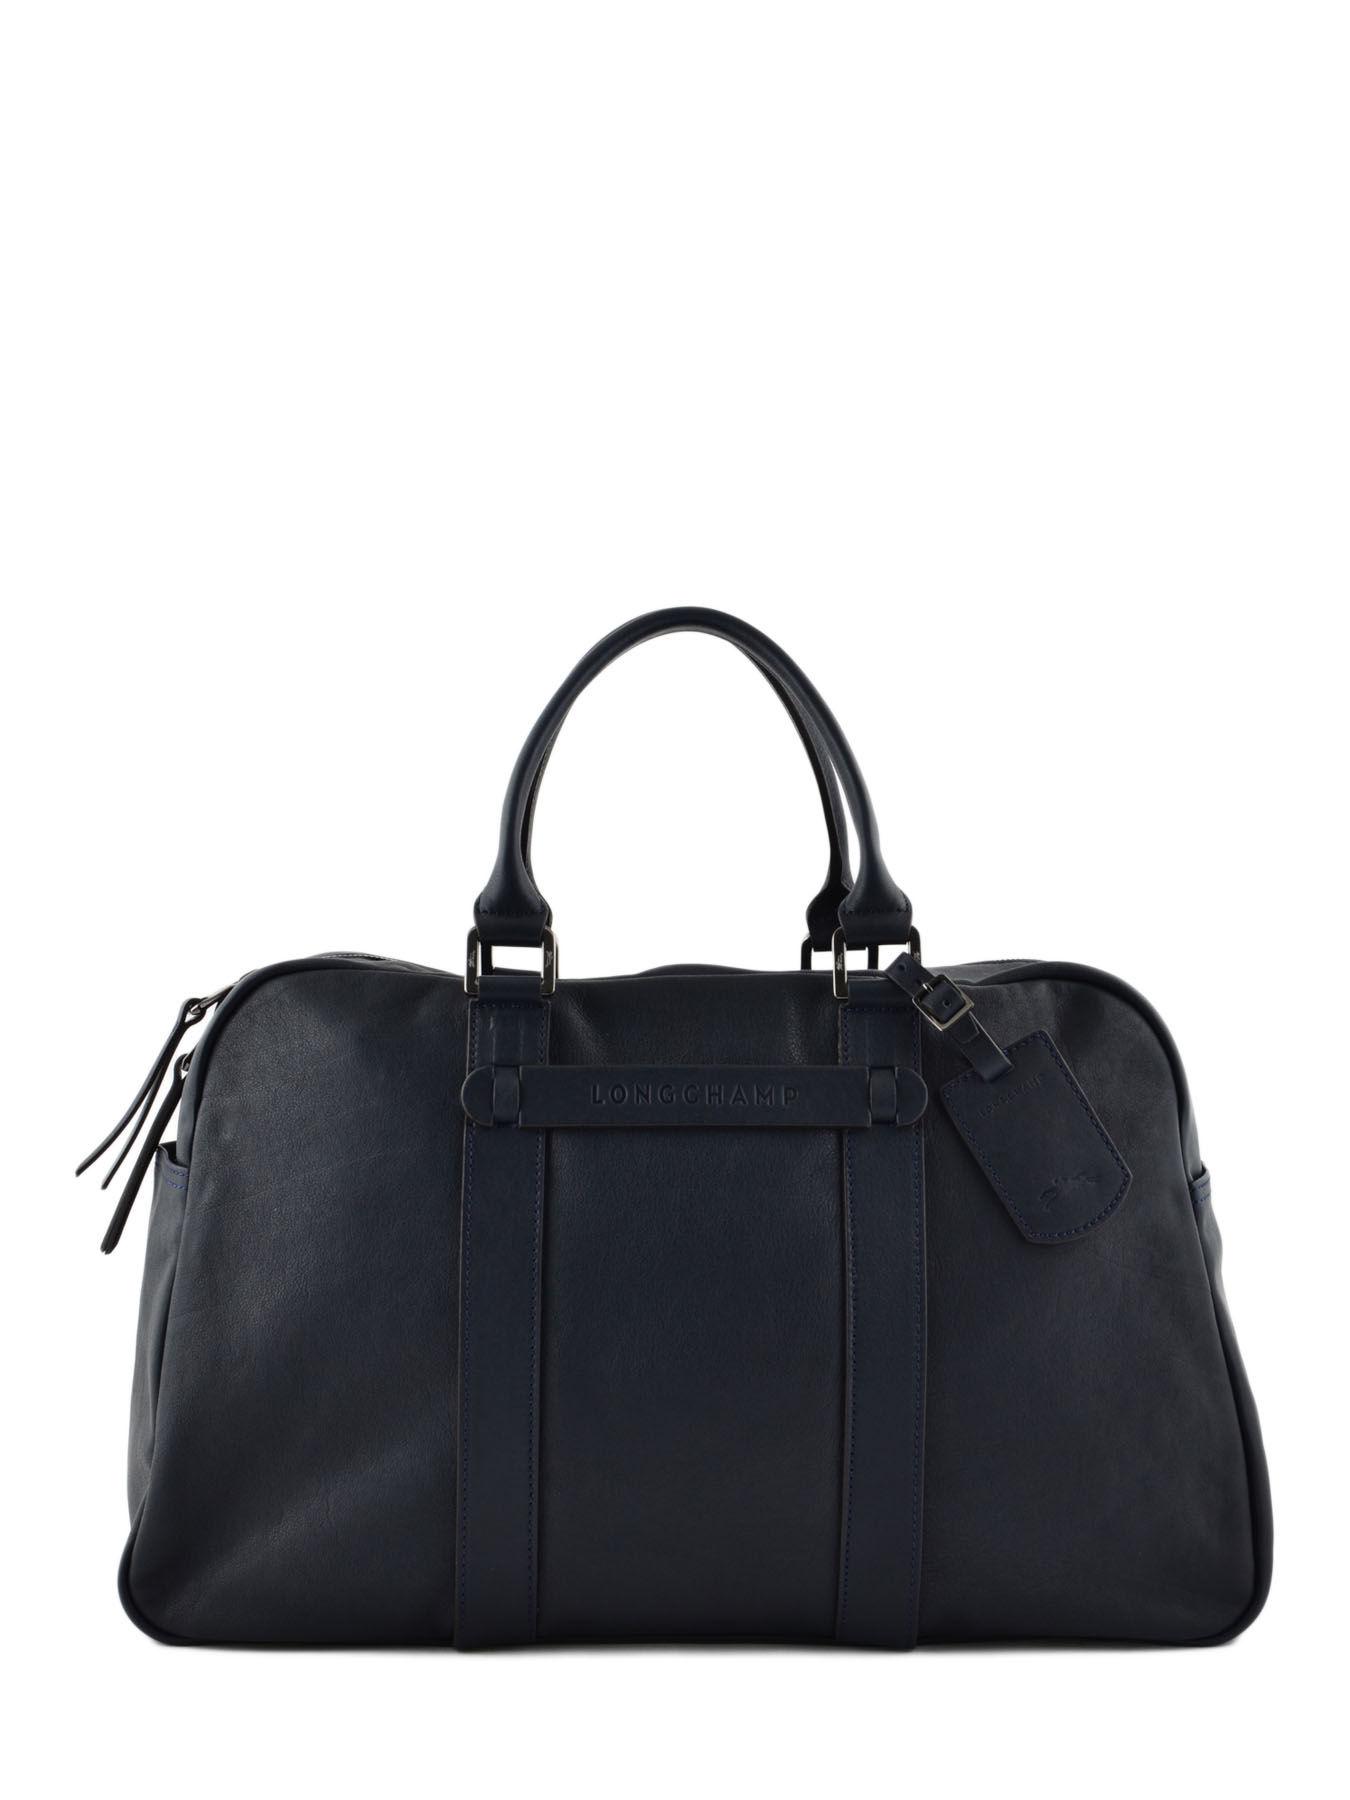 Longchamp Longchamp 3d Besace Noir